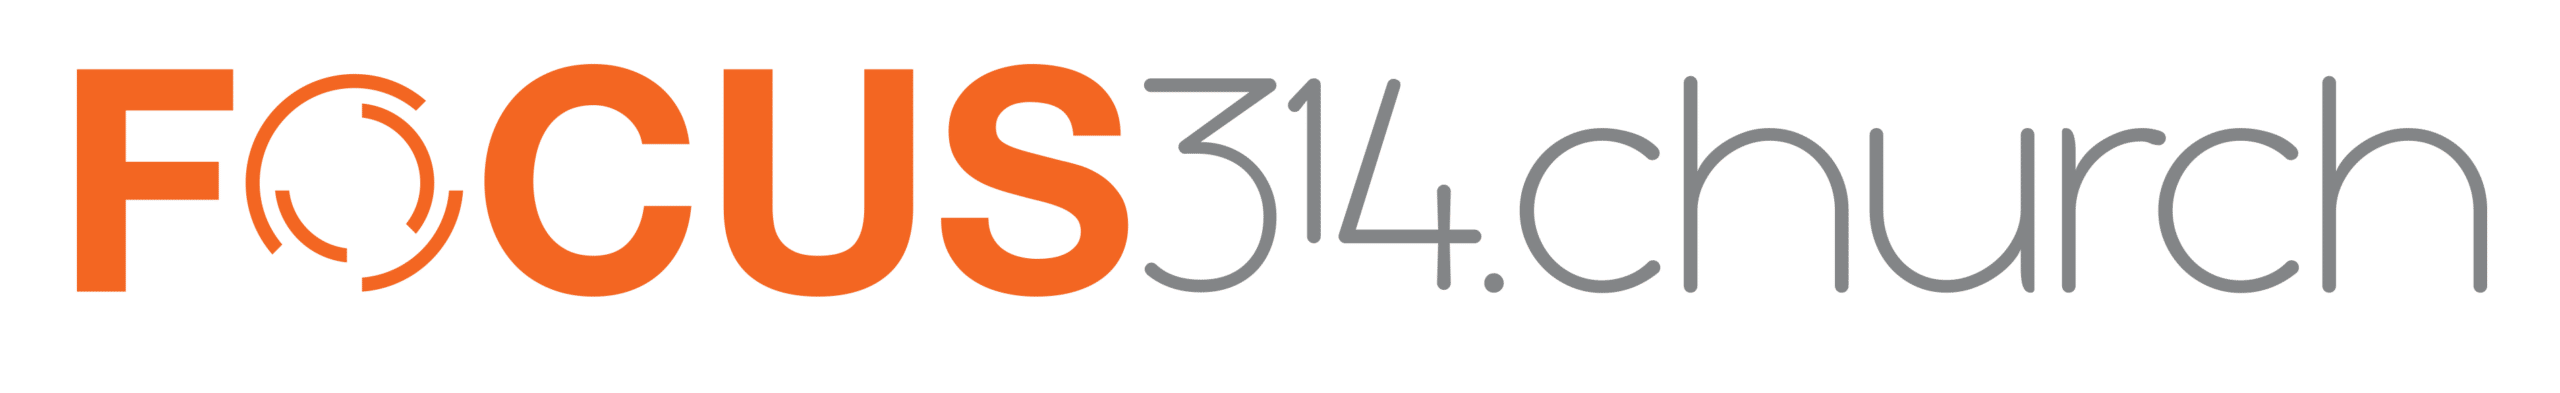 Focus3-14-header-logo-for-swap